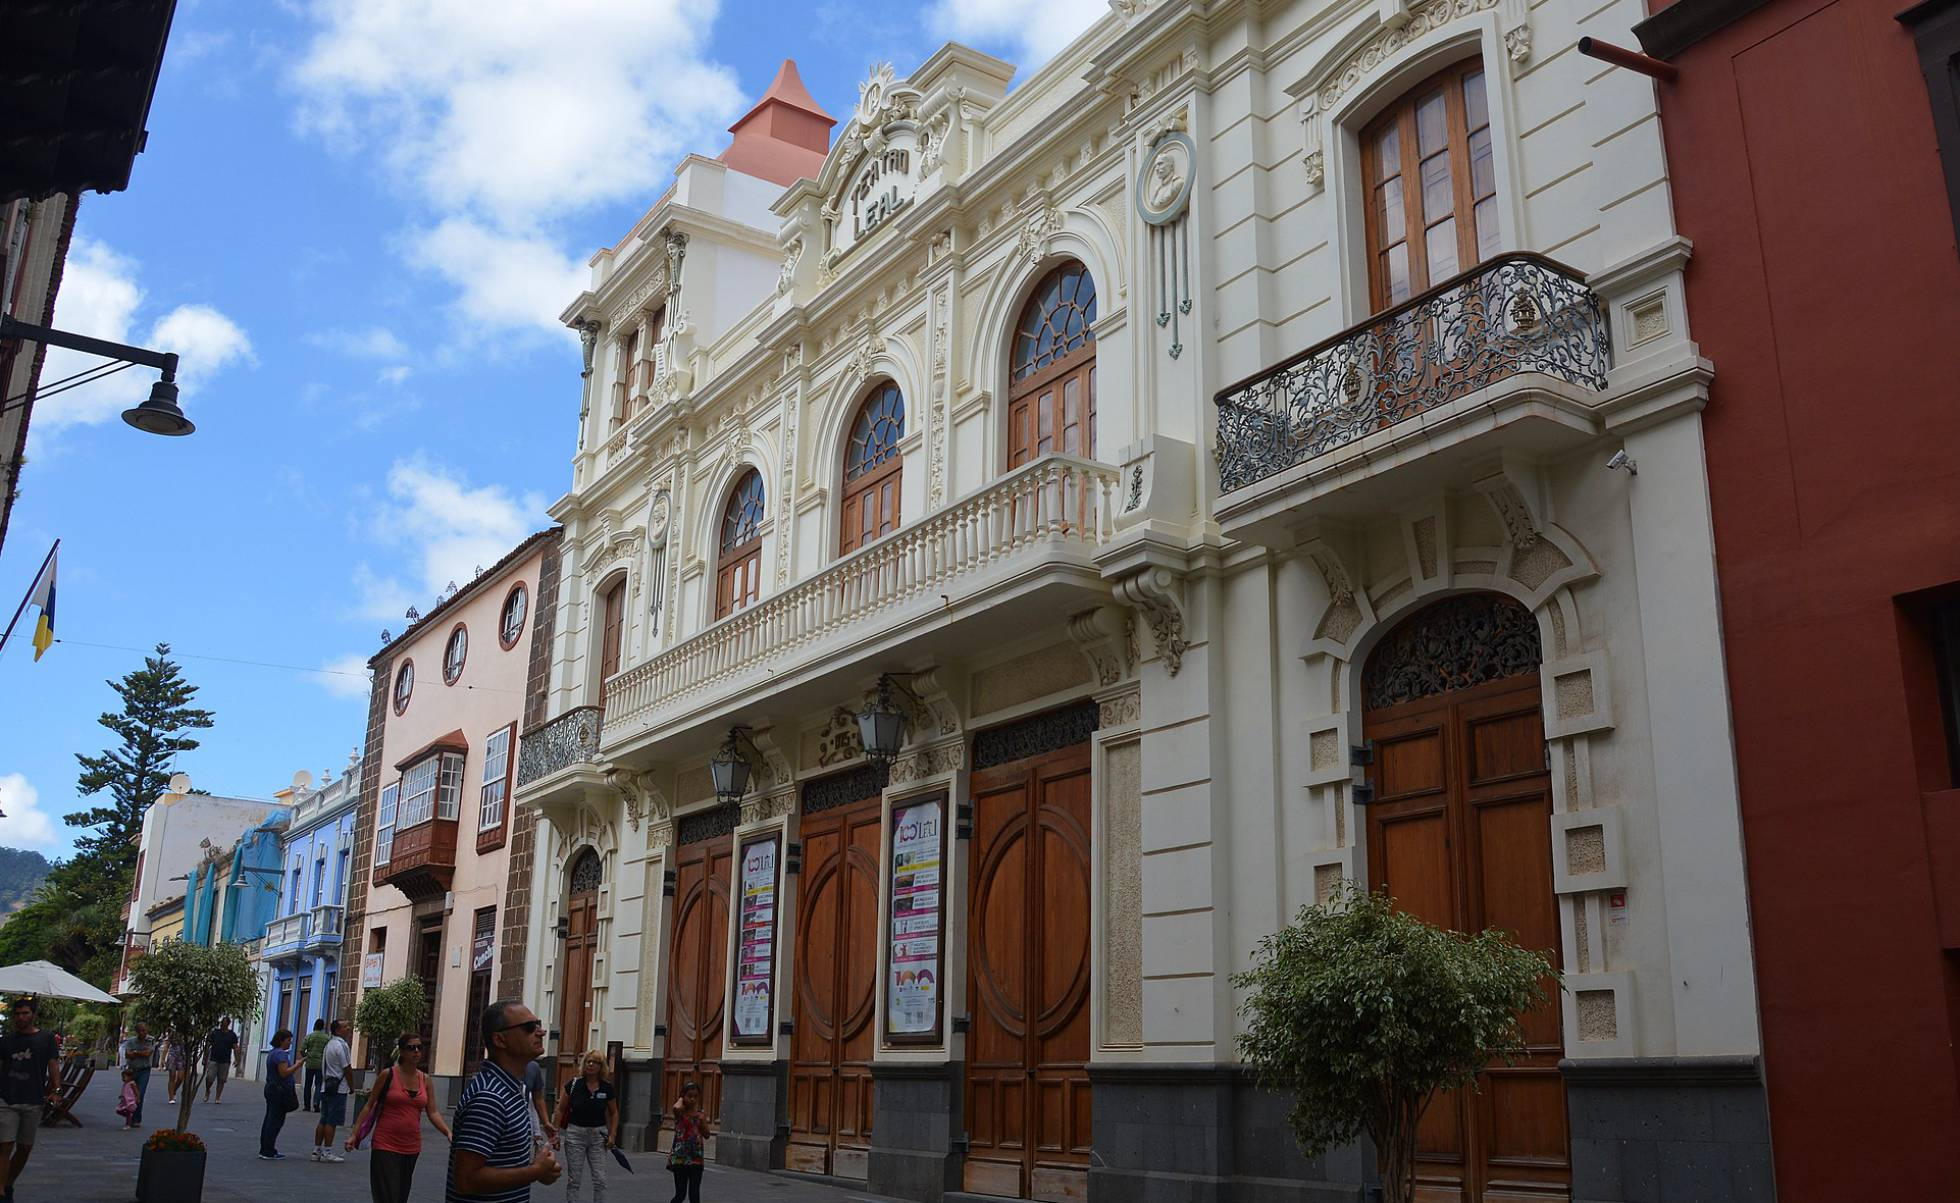 asesinada por violencia de género en La Laguna (Tenerife)